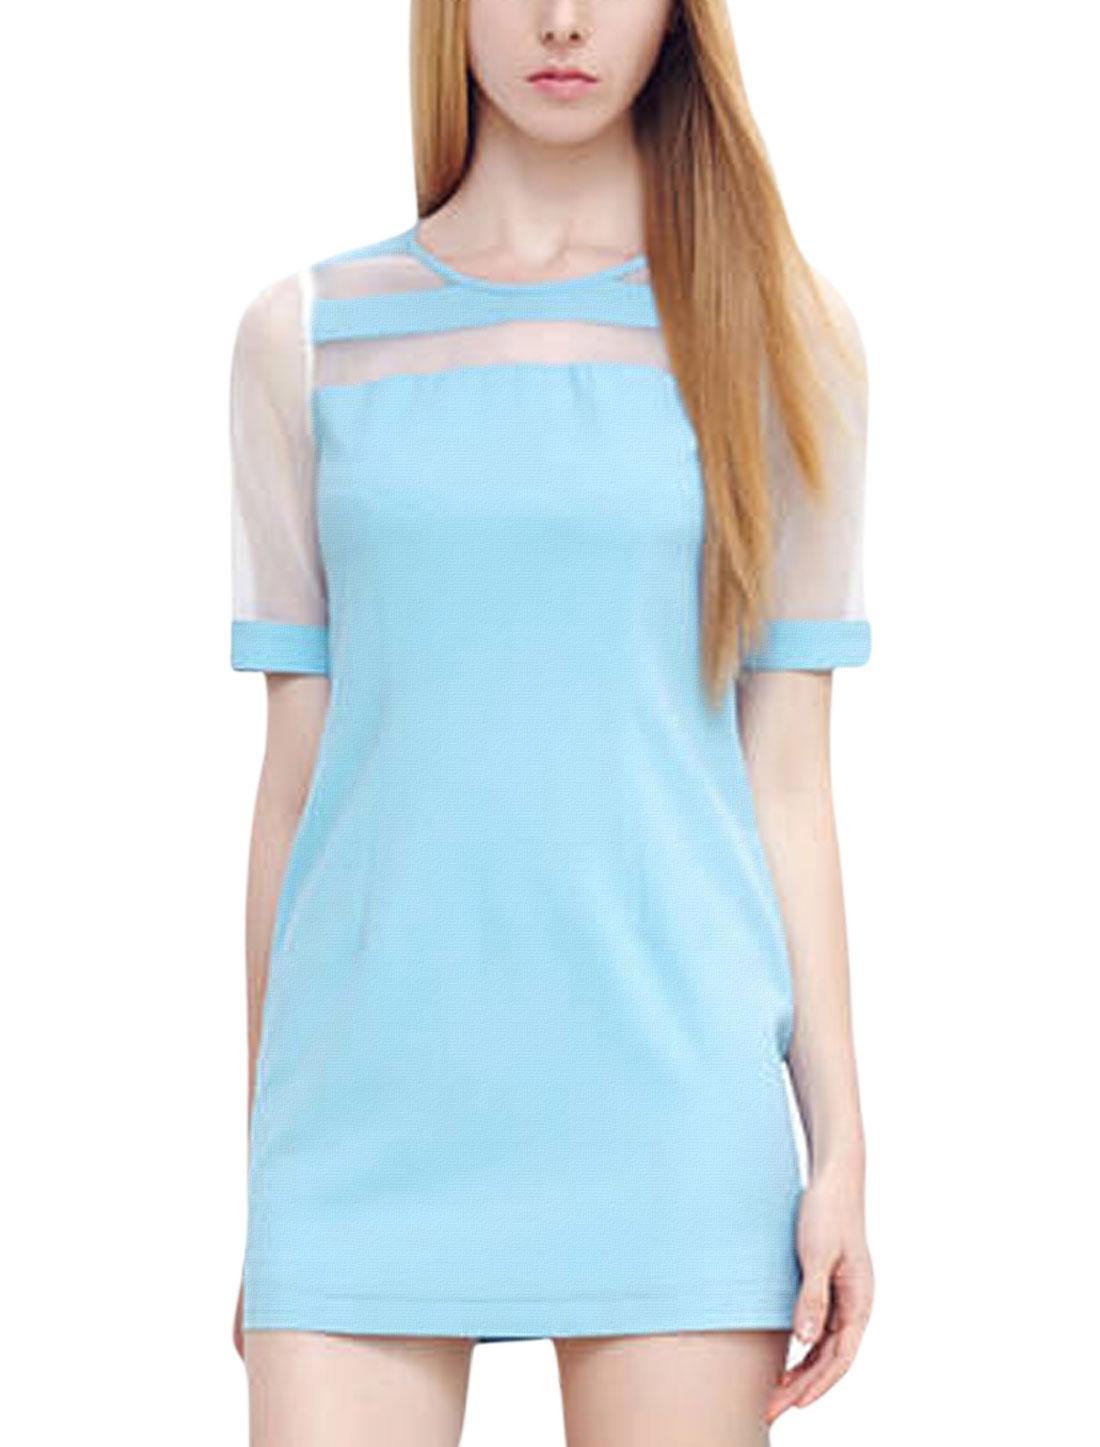 Lady Semi-Sheer Sleeve Concealed Zipper Side Shift Dress Sky Blue M